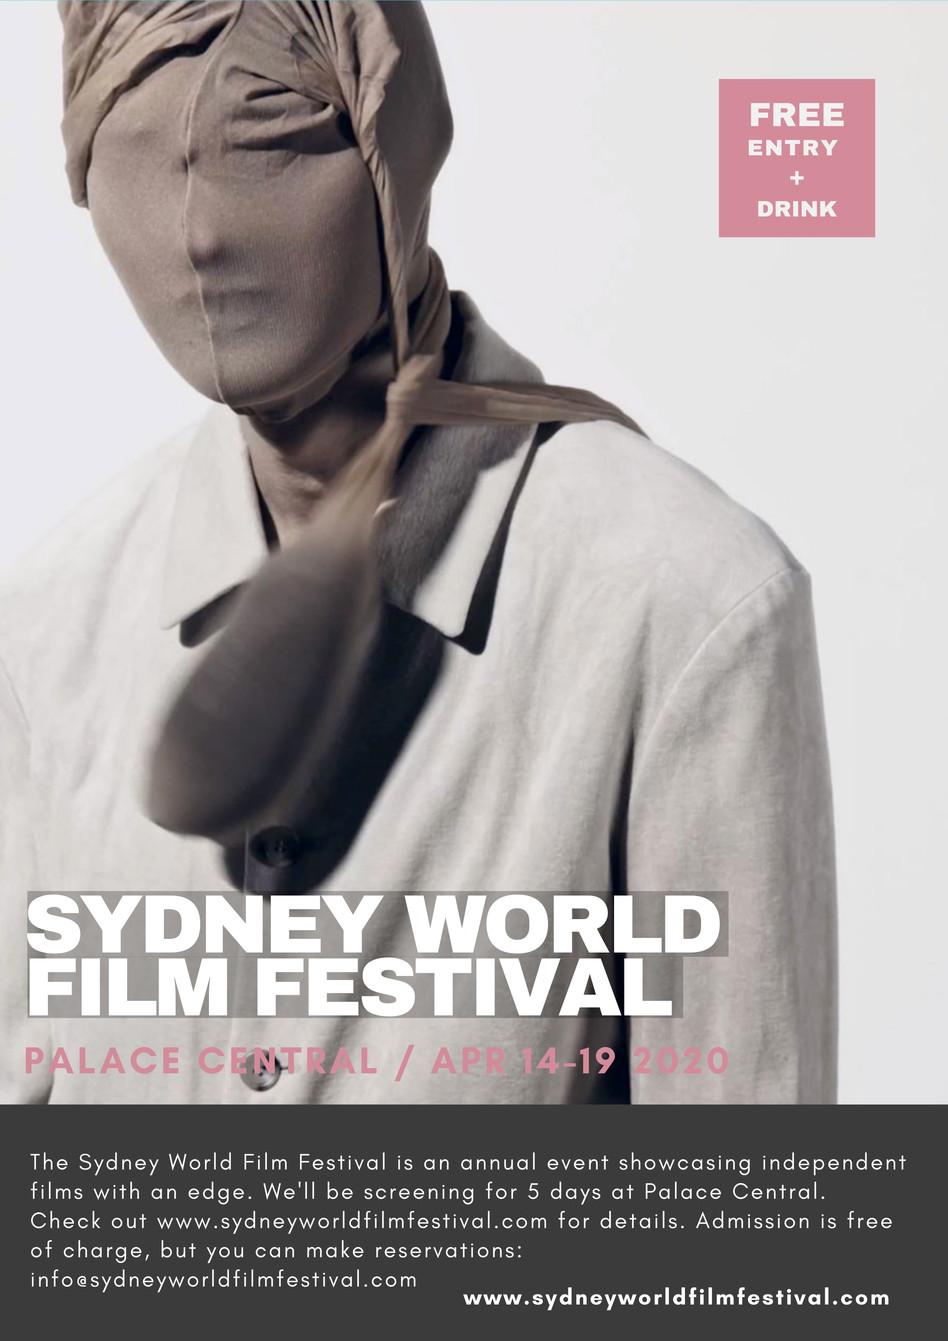 Sydney World Film Festival